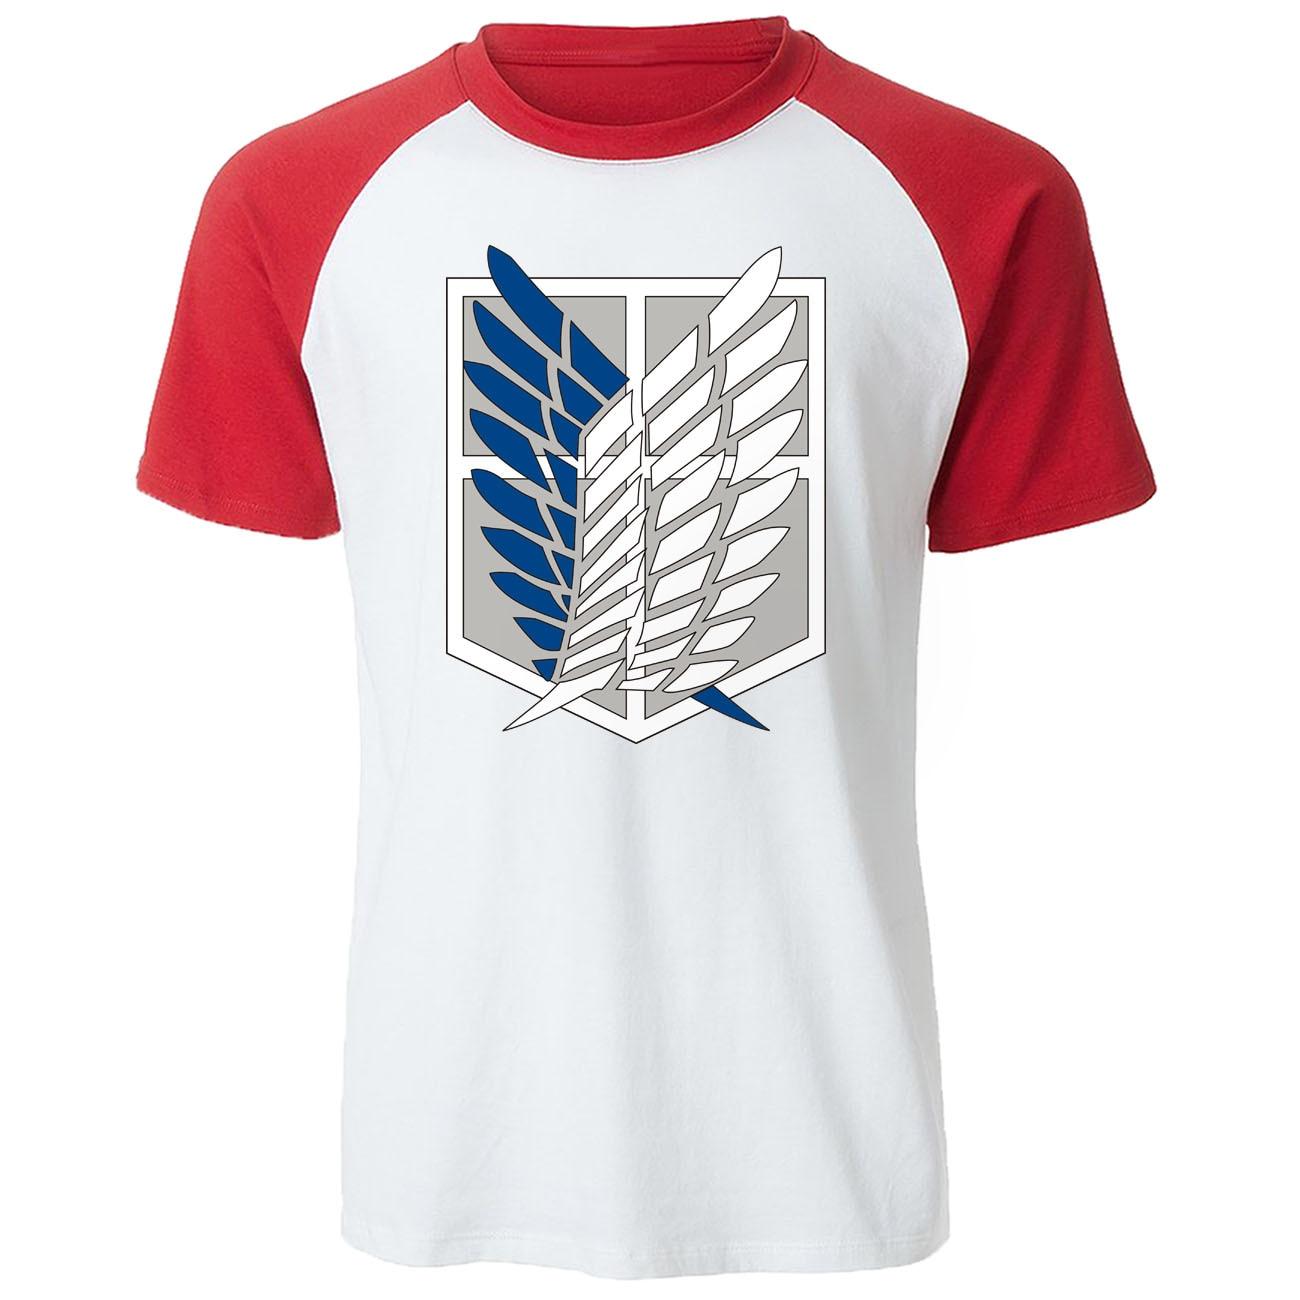 Wings Of Freedom Mikasa camisetas para hombre, camiseta de Anime japonés, camiseta de manga corta raglán para hombre, camisetas de verano ataque a los Titanes, camiseta para hombre